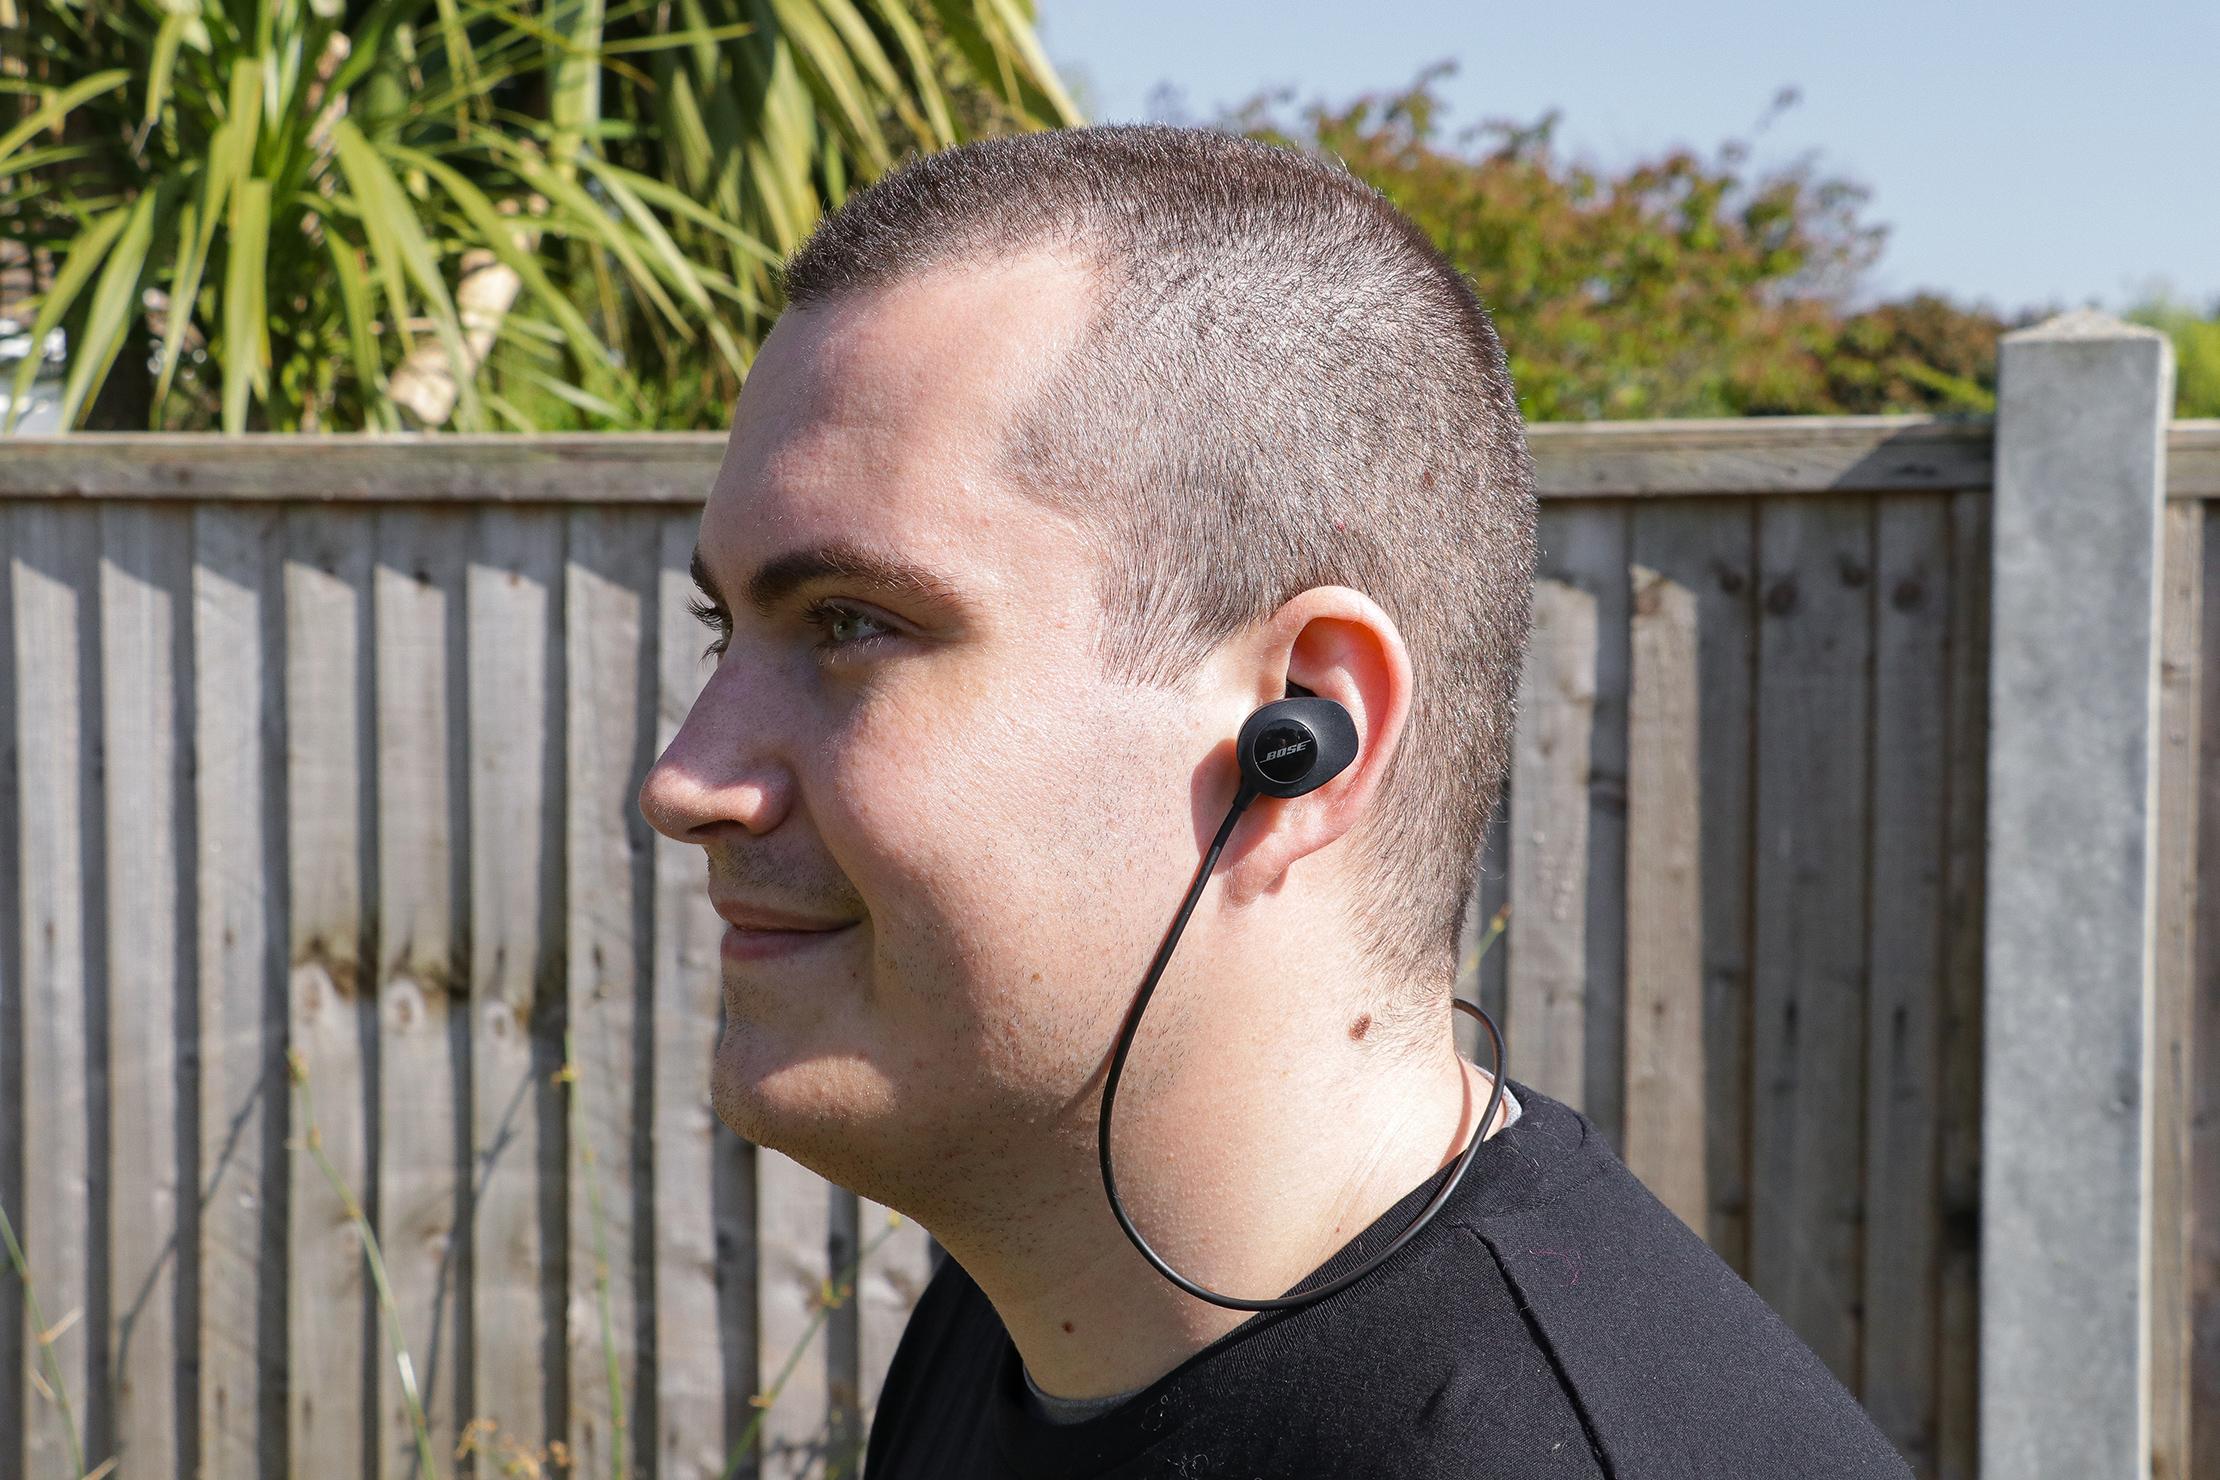 Bose SoundSport Earbuds